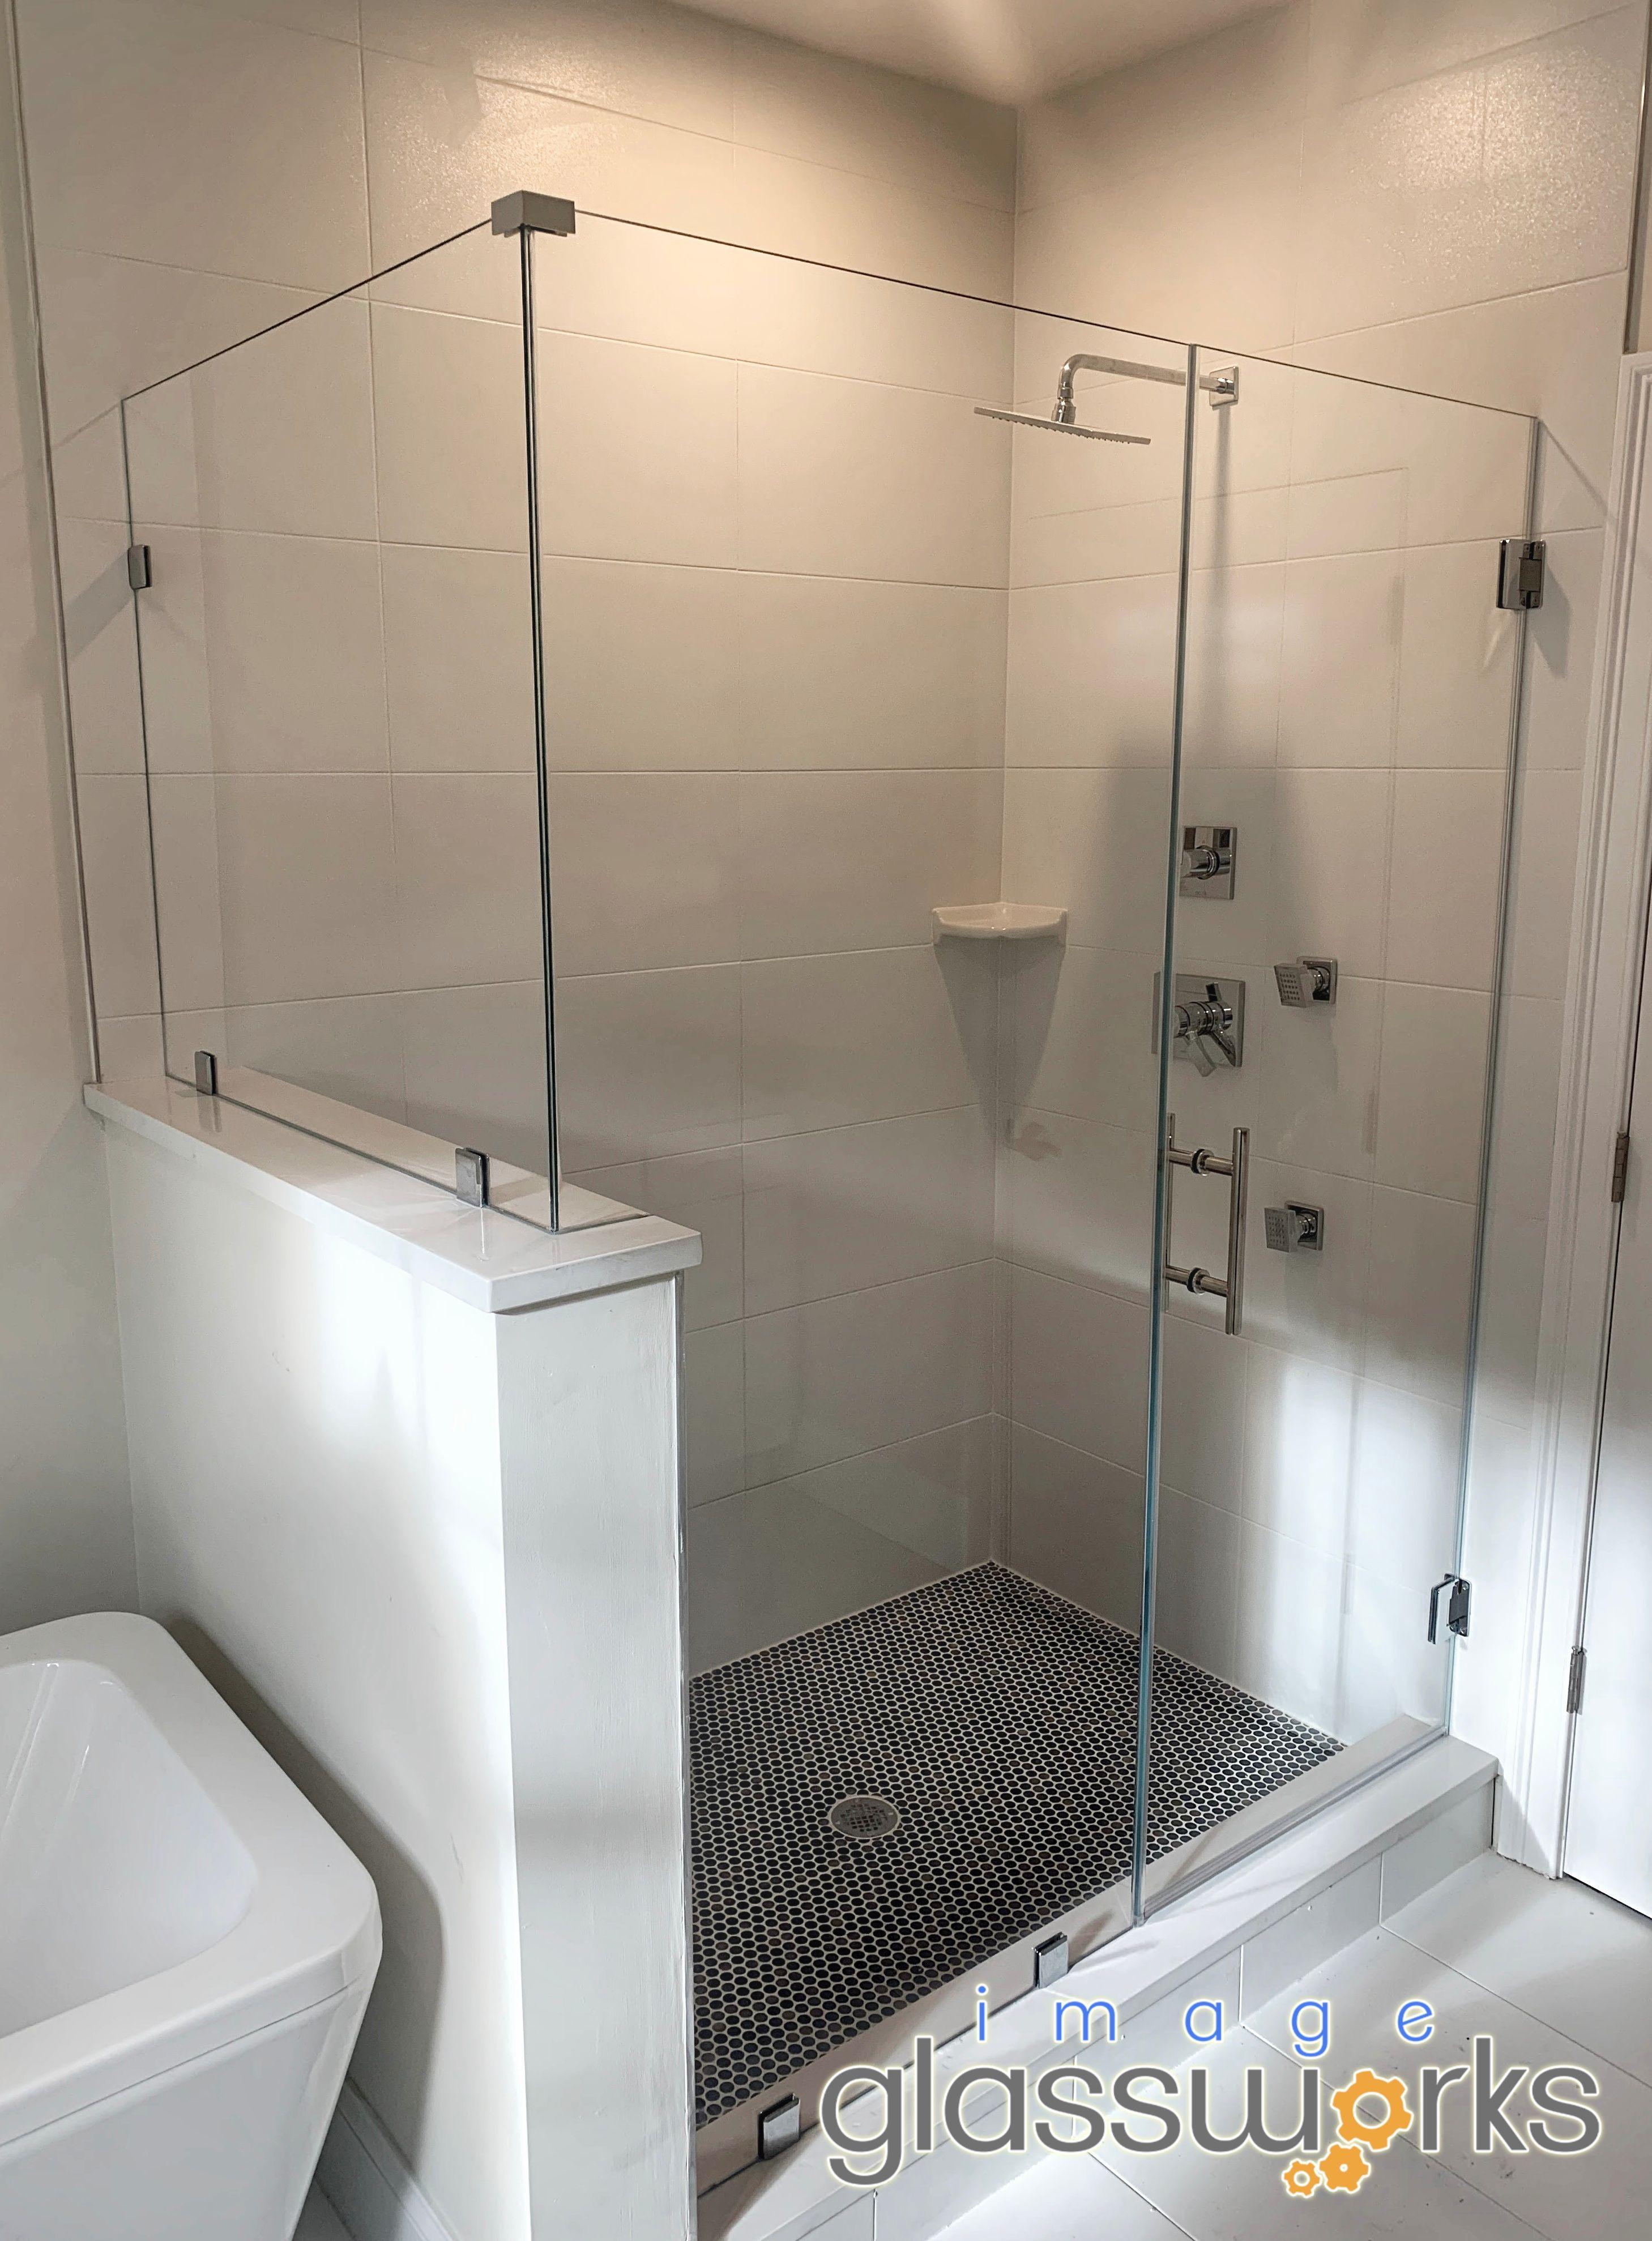 Beautiful 3 Panel Shower Door Using Low Iron No Green Tint Glass